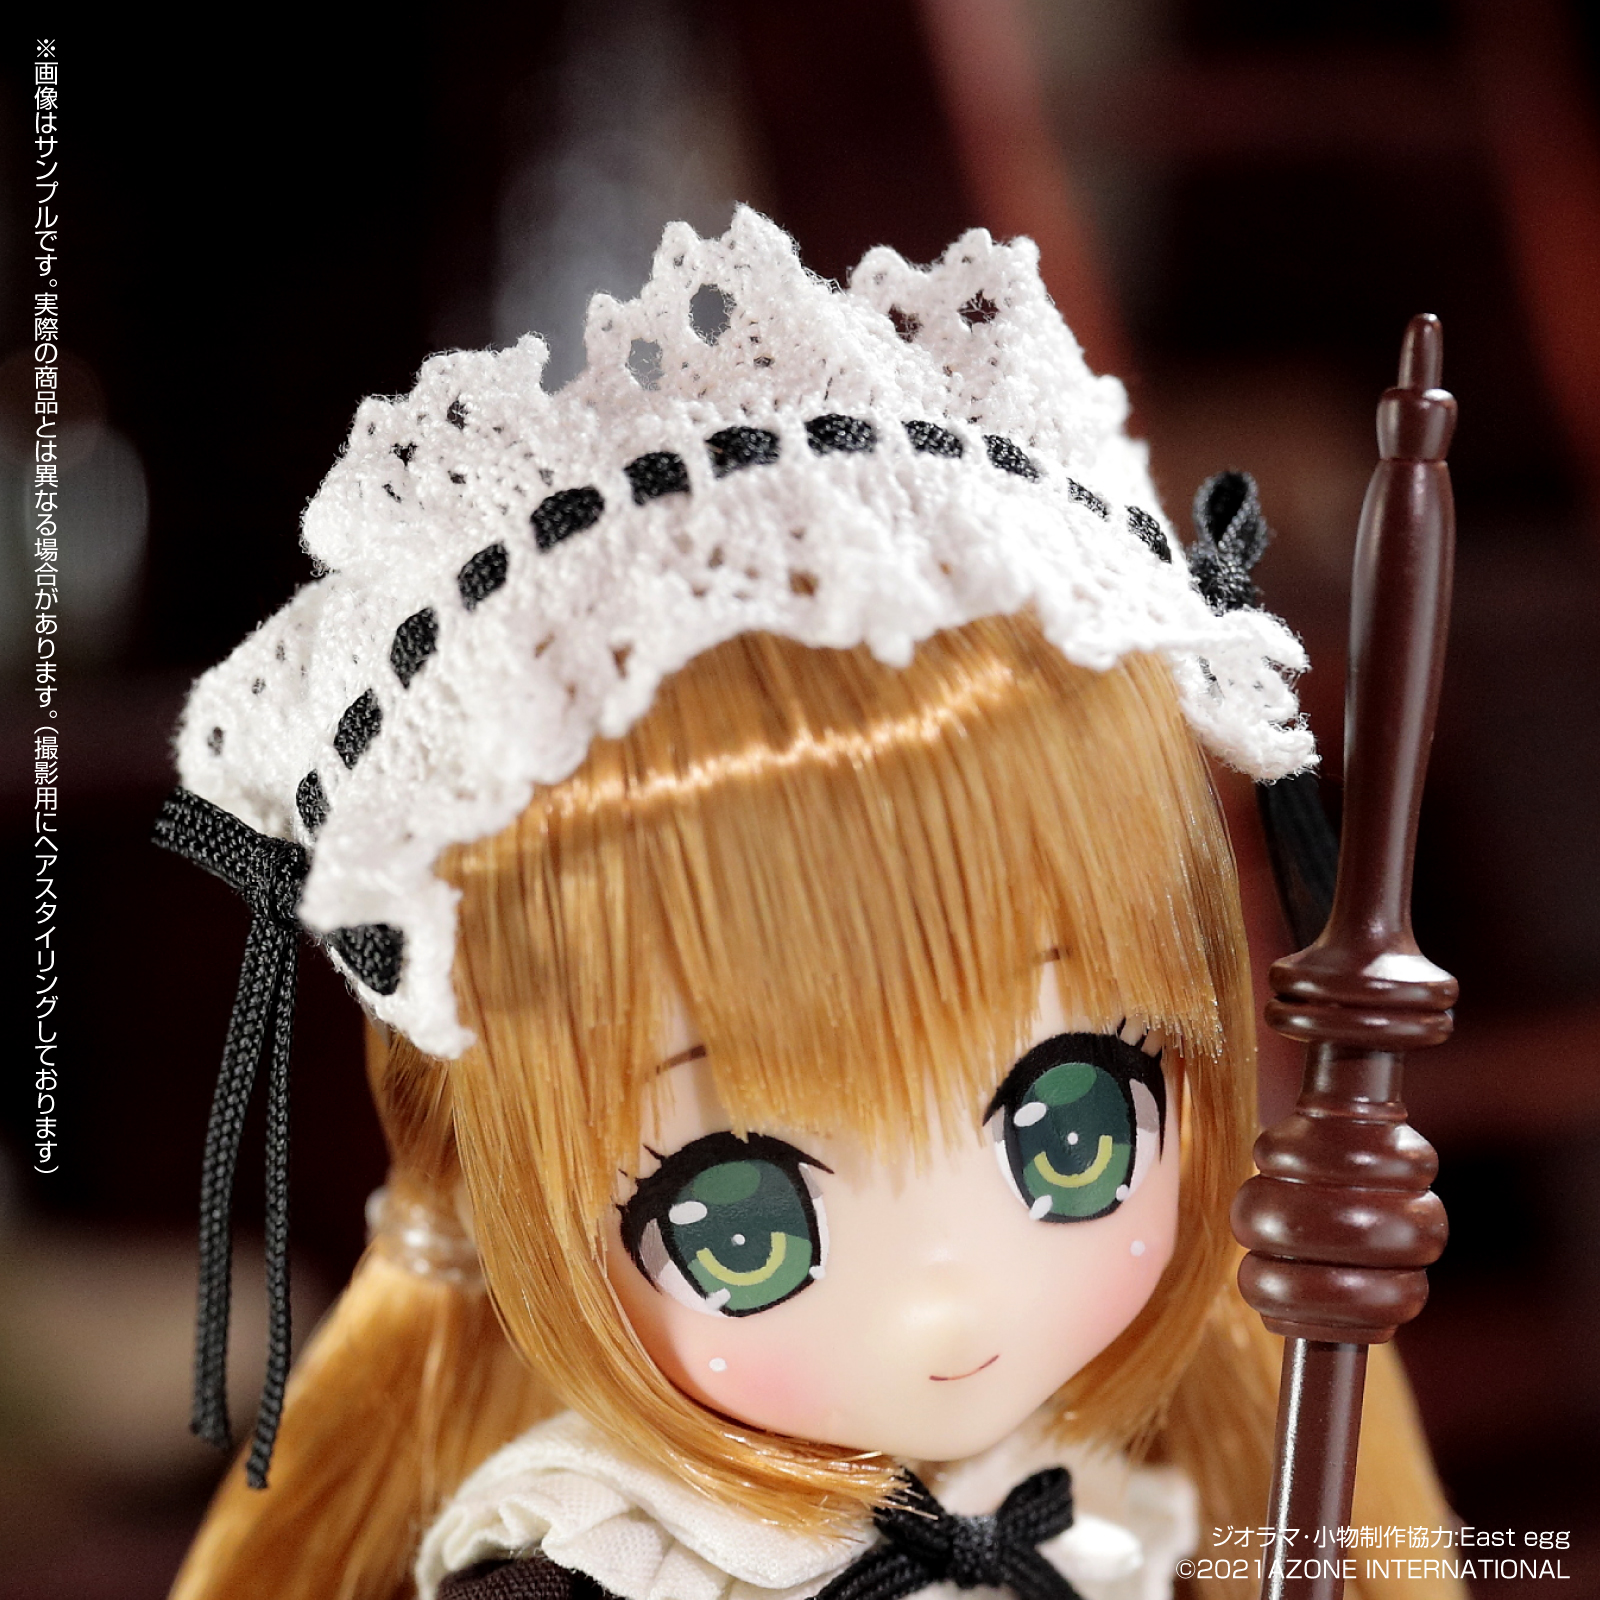 Lil'Fairy ~ちいさなお手伝いさん~『リプー 7th anniv.(ノーマル口ver.)』1/12 完成品ドール-015